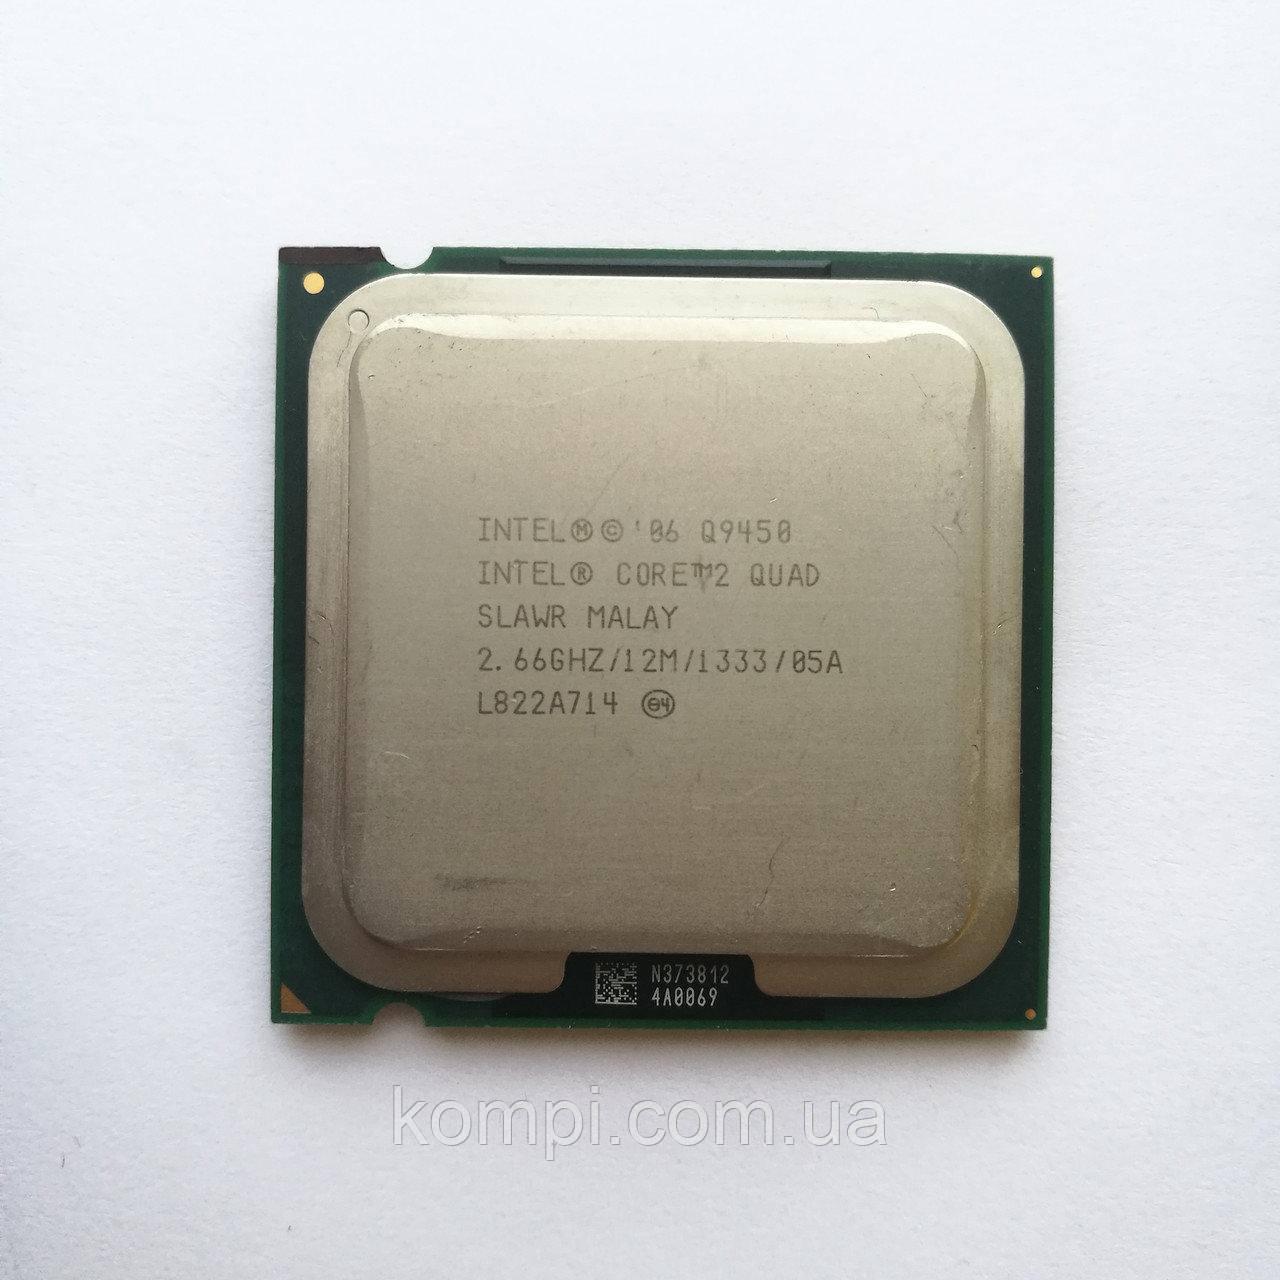 Процессор Intel Core 2 Quad Q9450 2.66GHz 12M 1333M